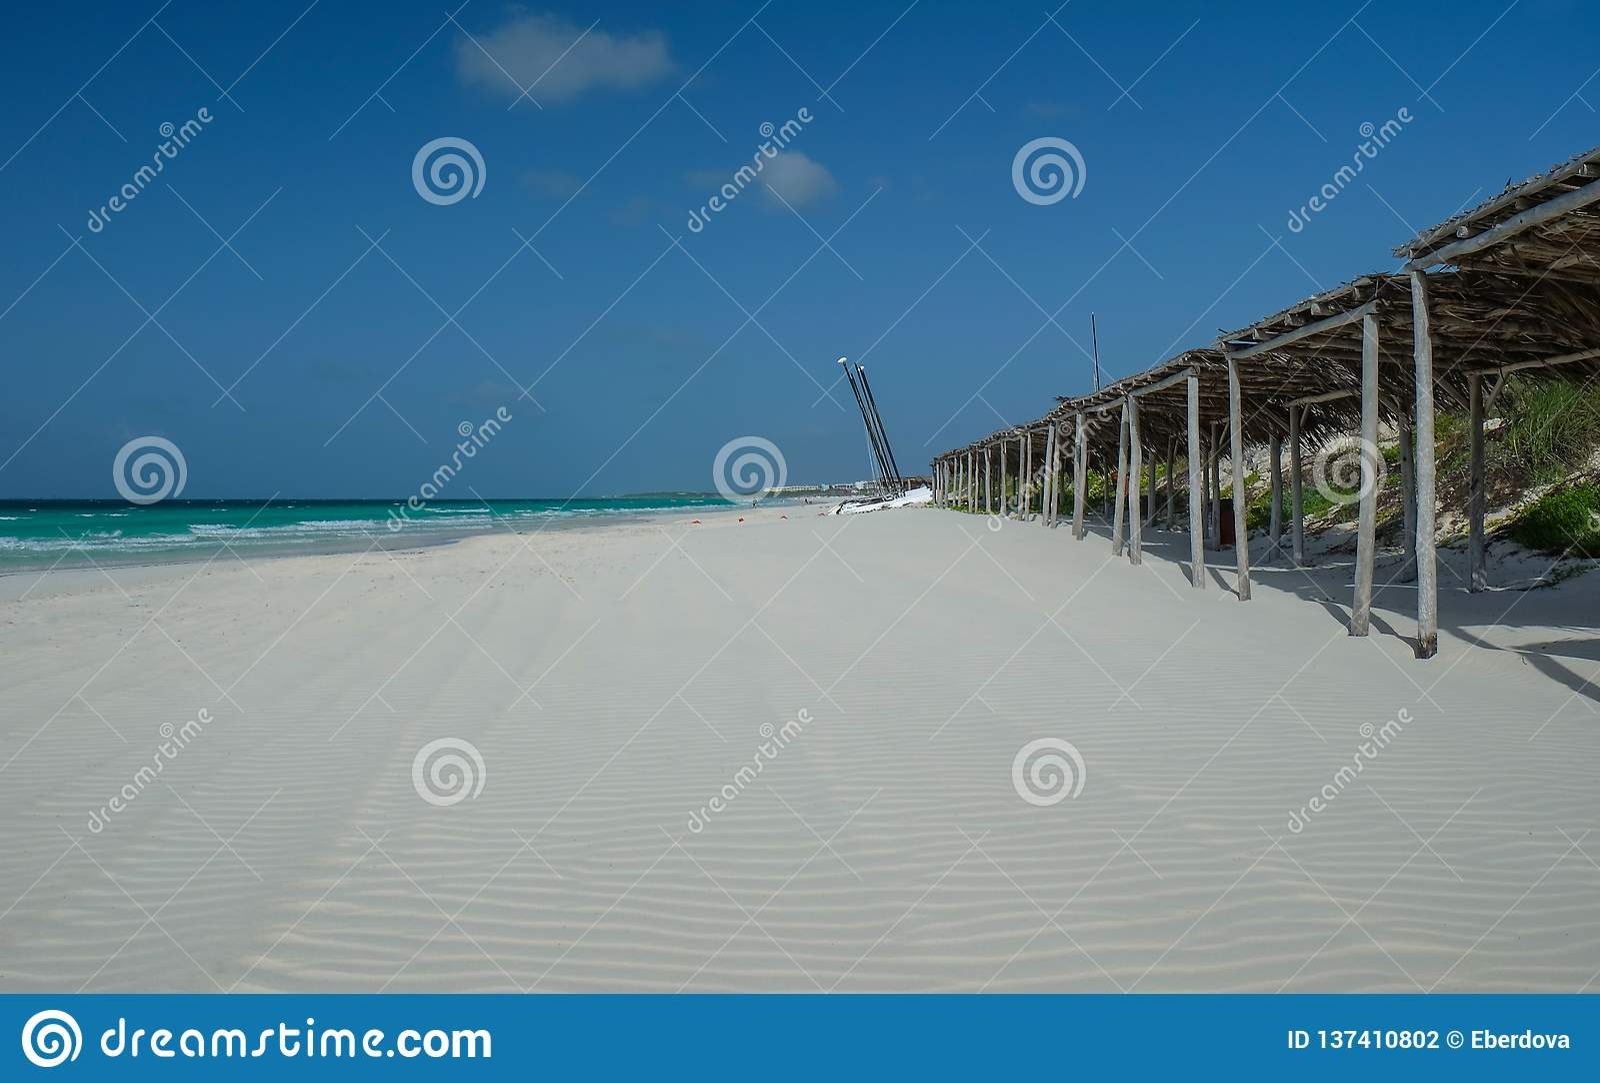 Eb bij eindeloos wit zand Cubaans strand